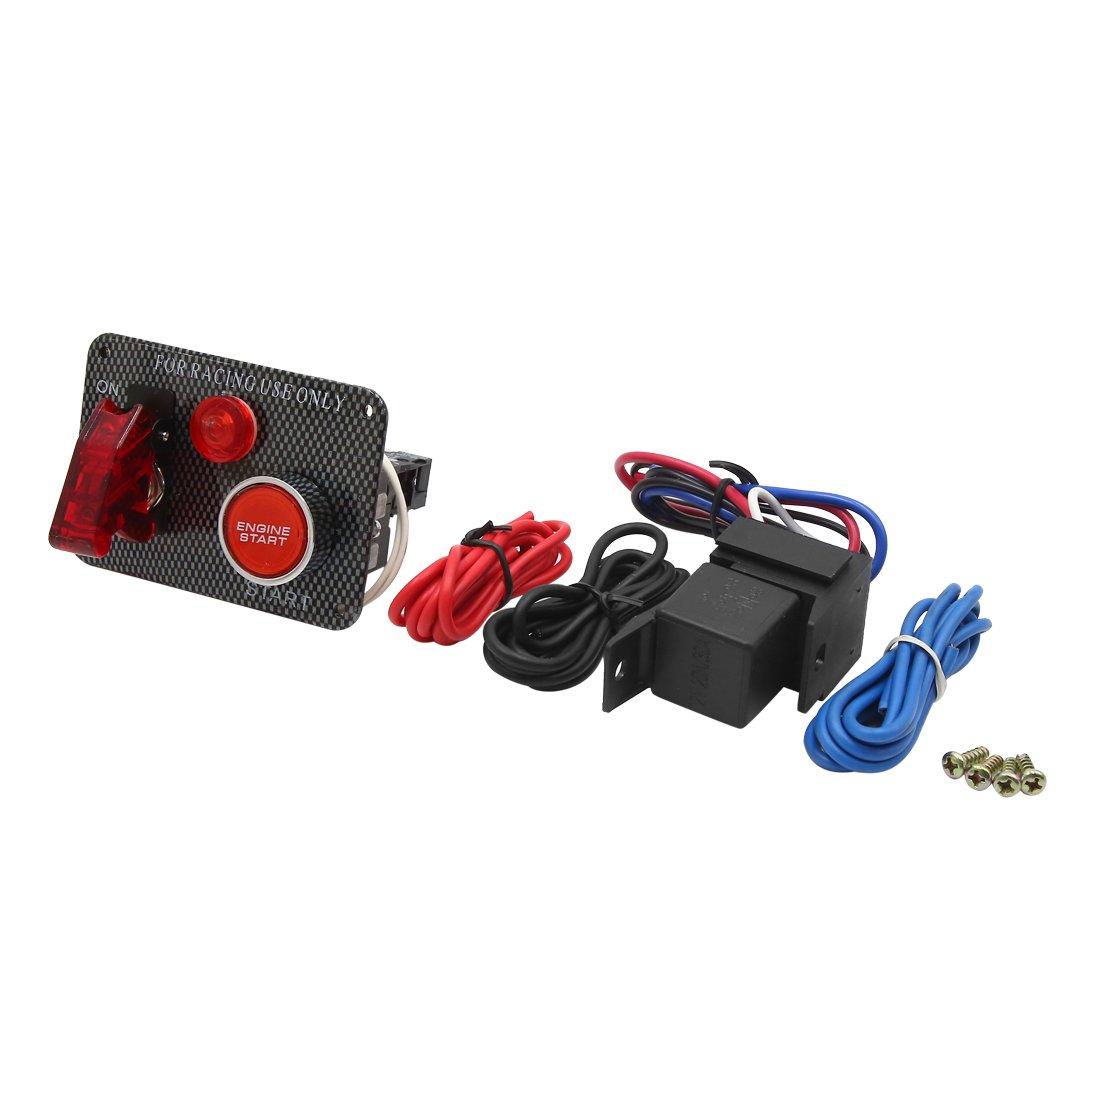 uxcell DC 12V Car Carbon Fiber Pattren Ignition Switch Panel Engine Start Push Button